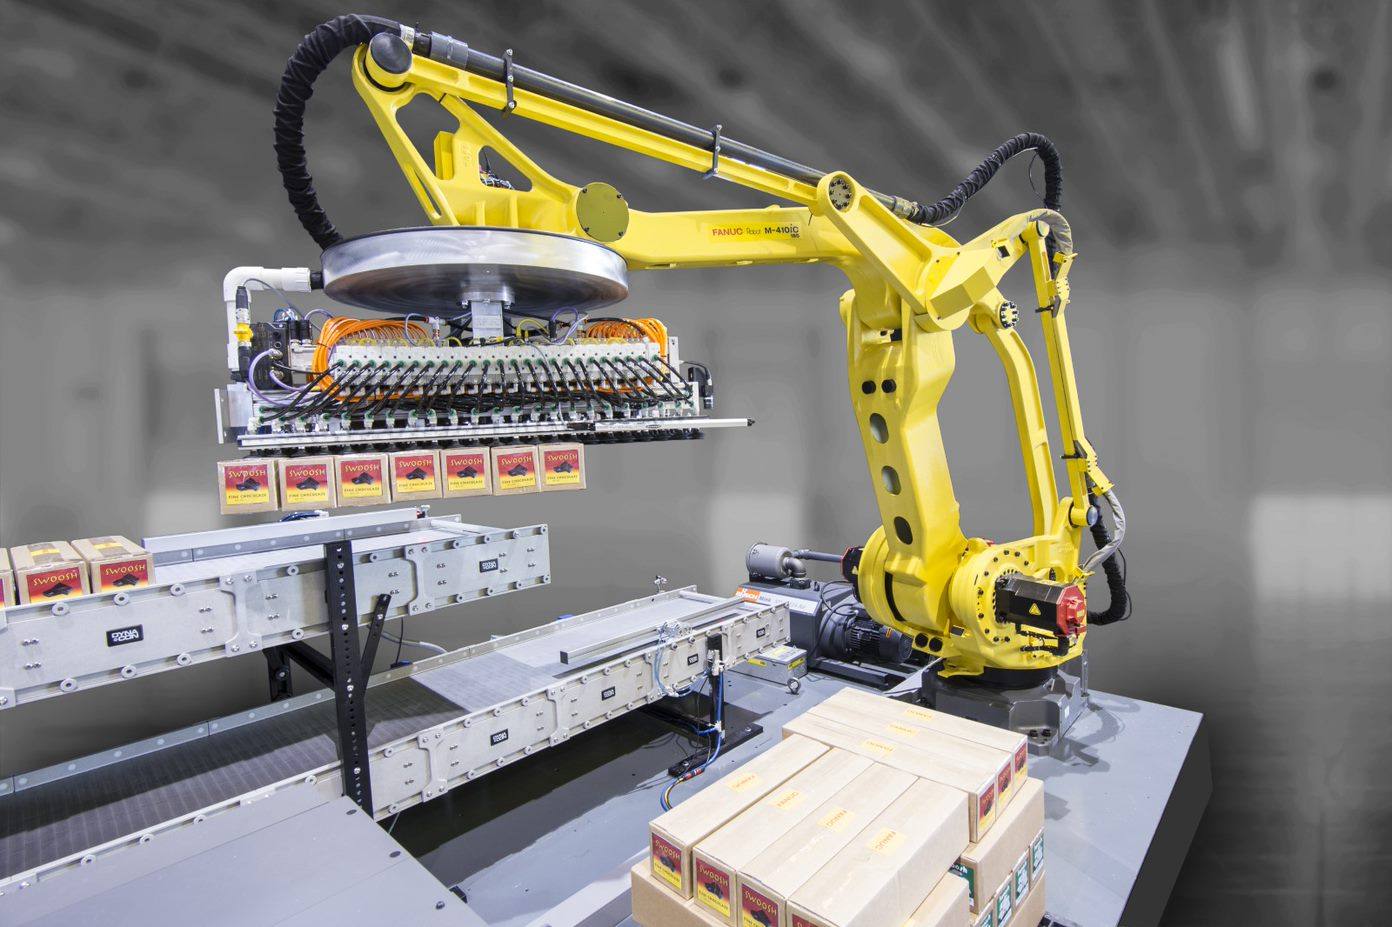 Fanuc Robot Image